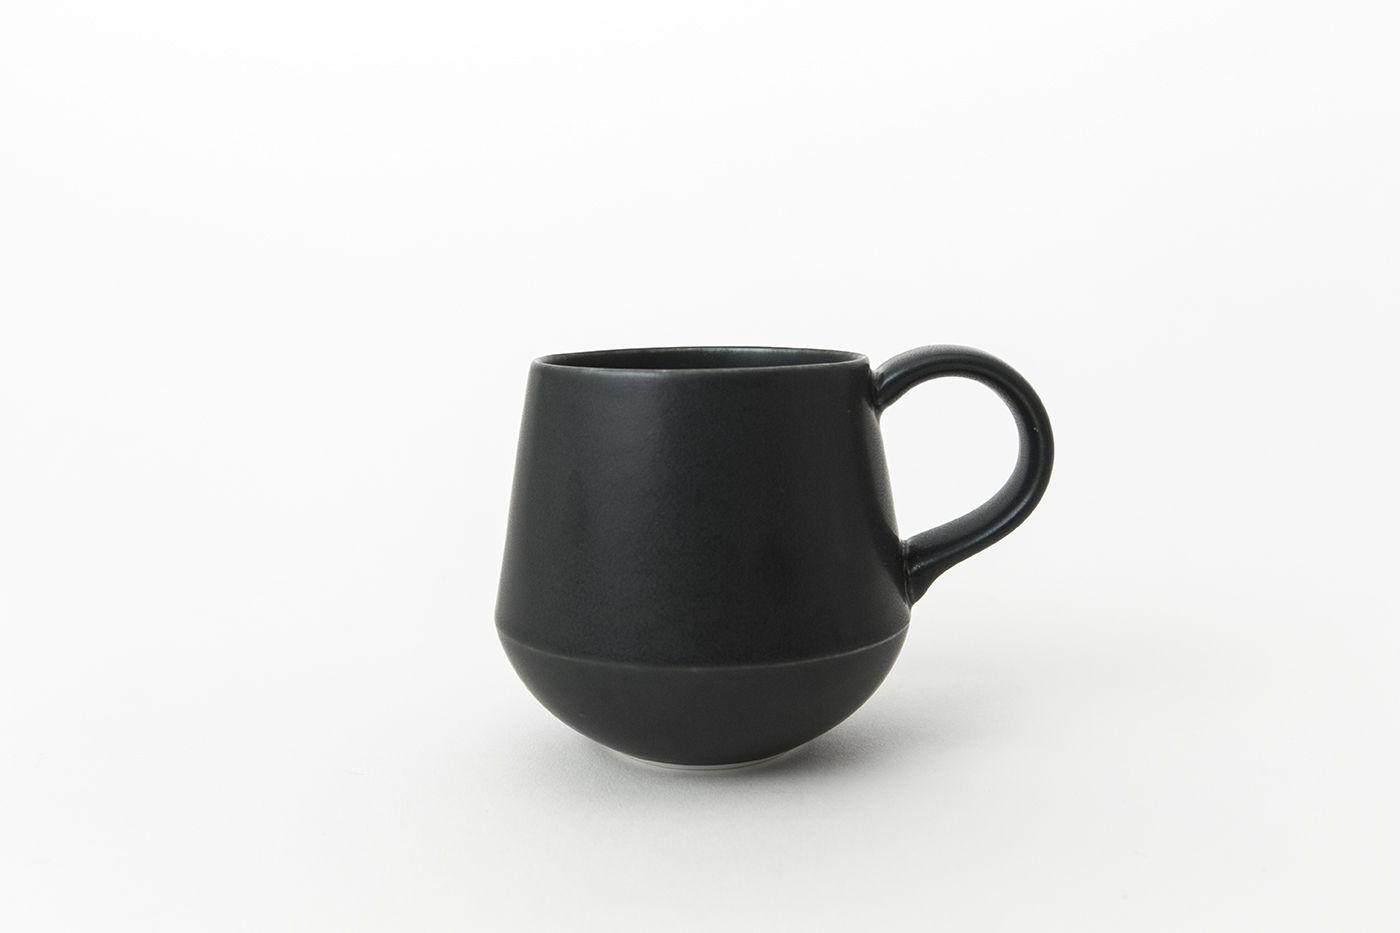 日本 KIHARA 藍素磁釉 咖啡杯